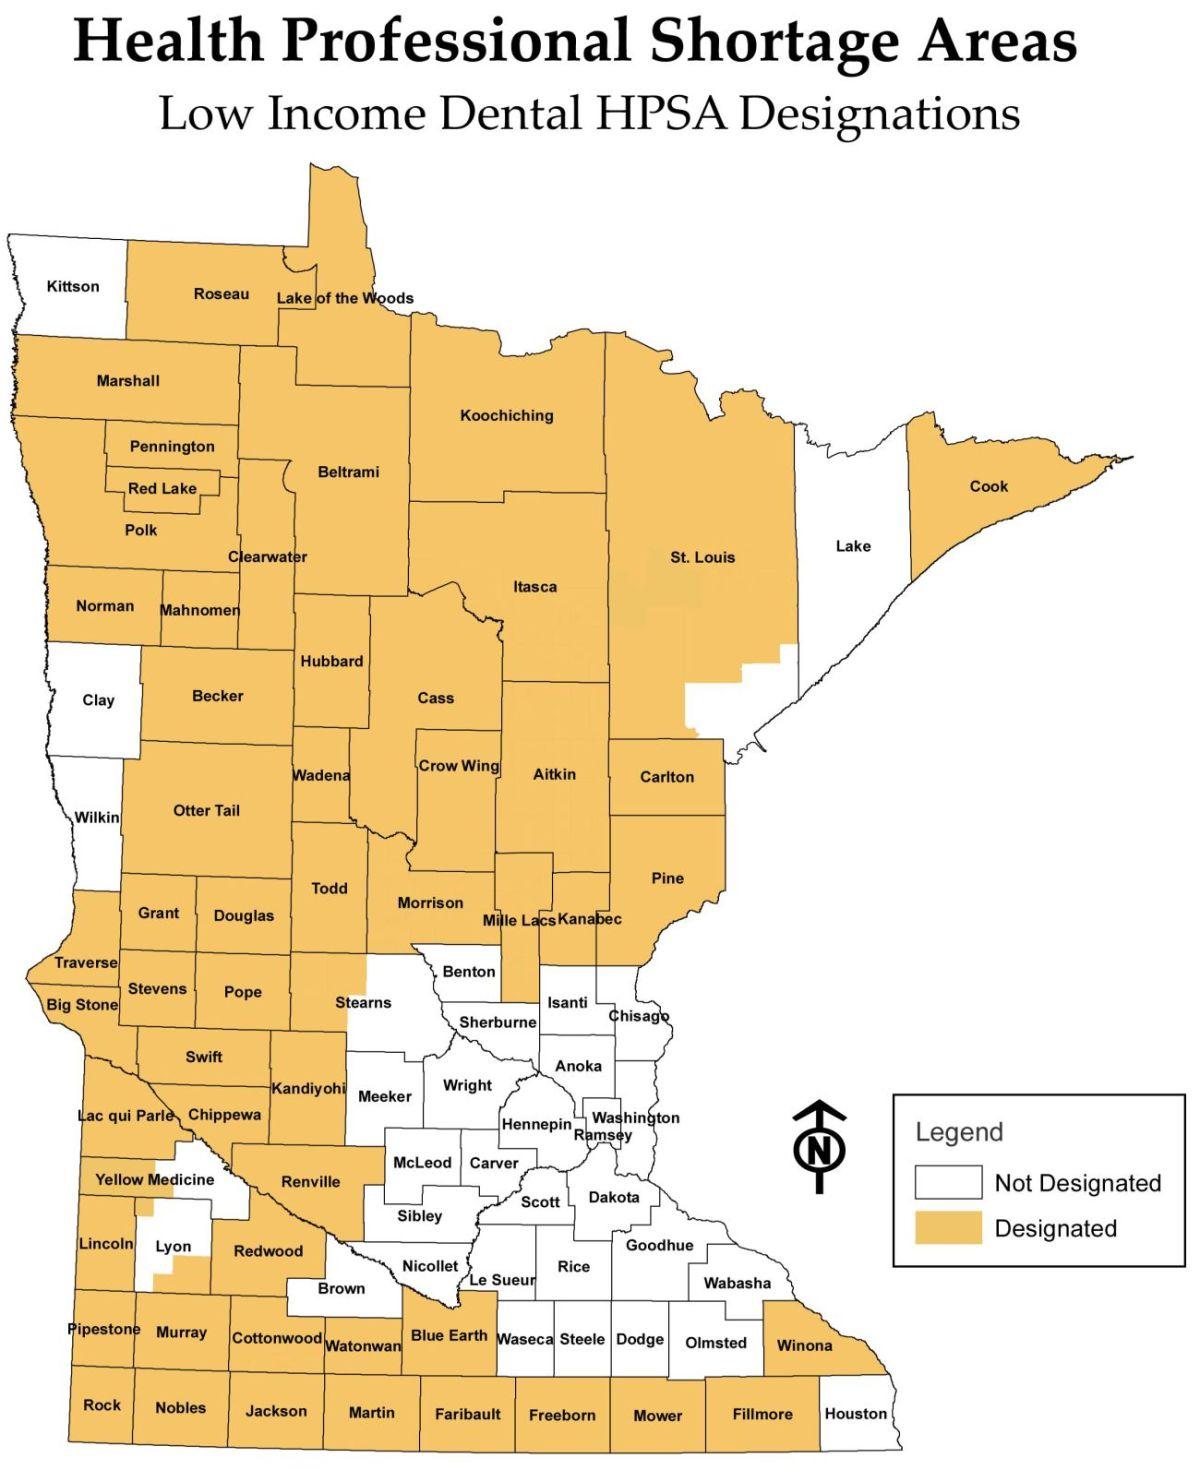 hight resolution of health professional shortage areas hspa low income dental hpsa designations minnesota